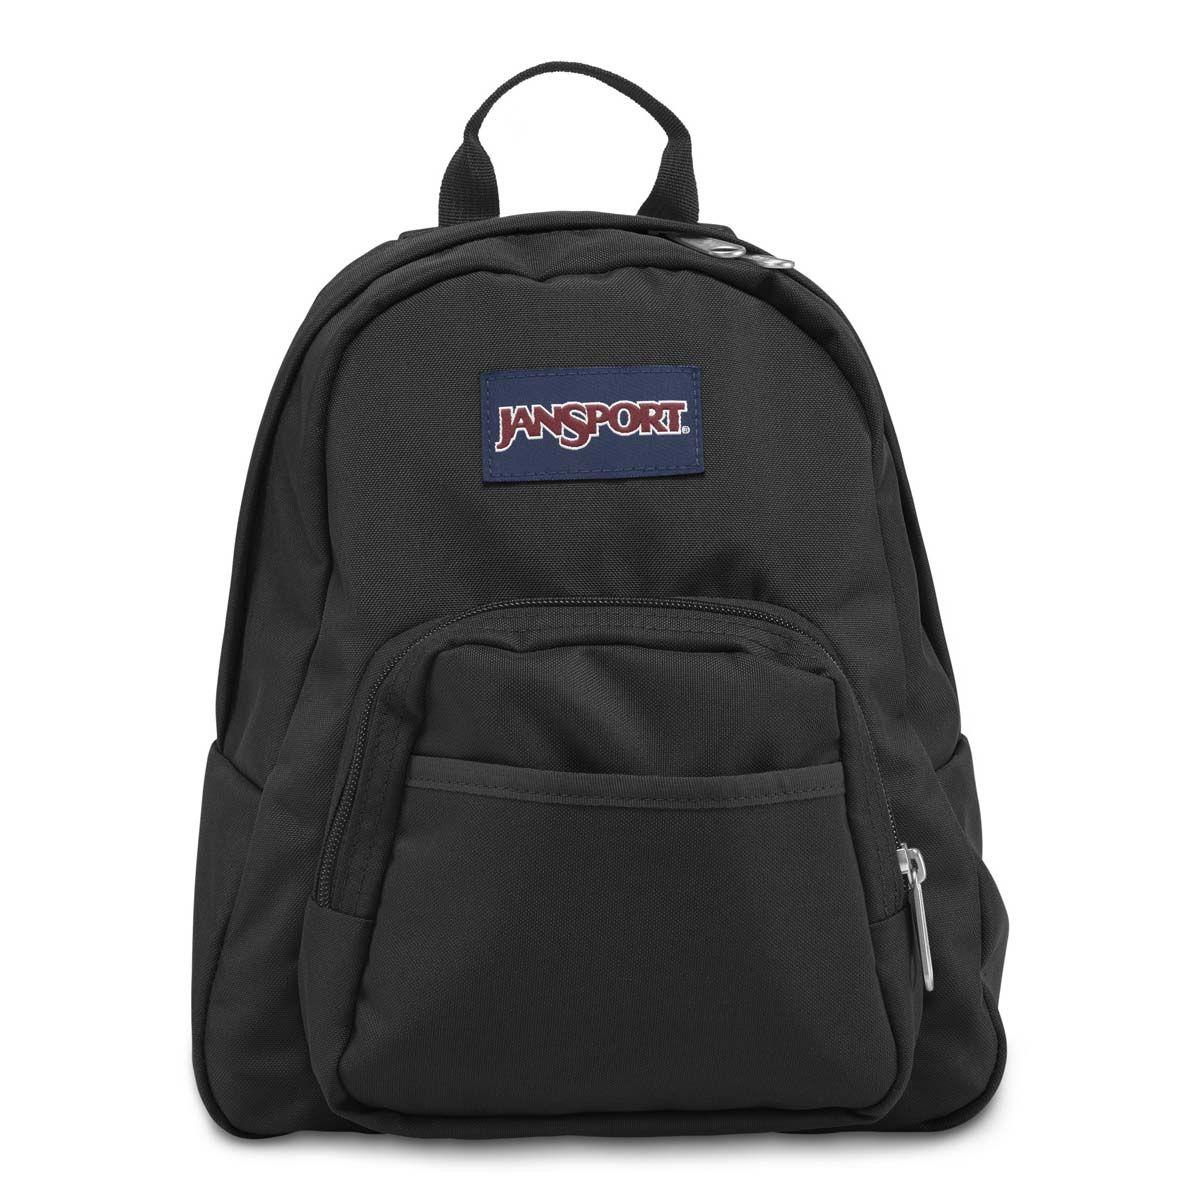 JanSport Half Pint Mini Backpack in Black